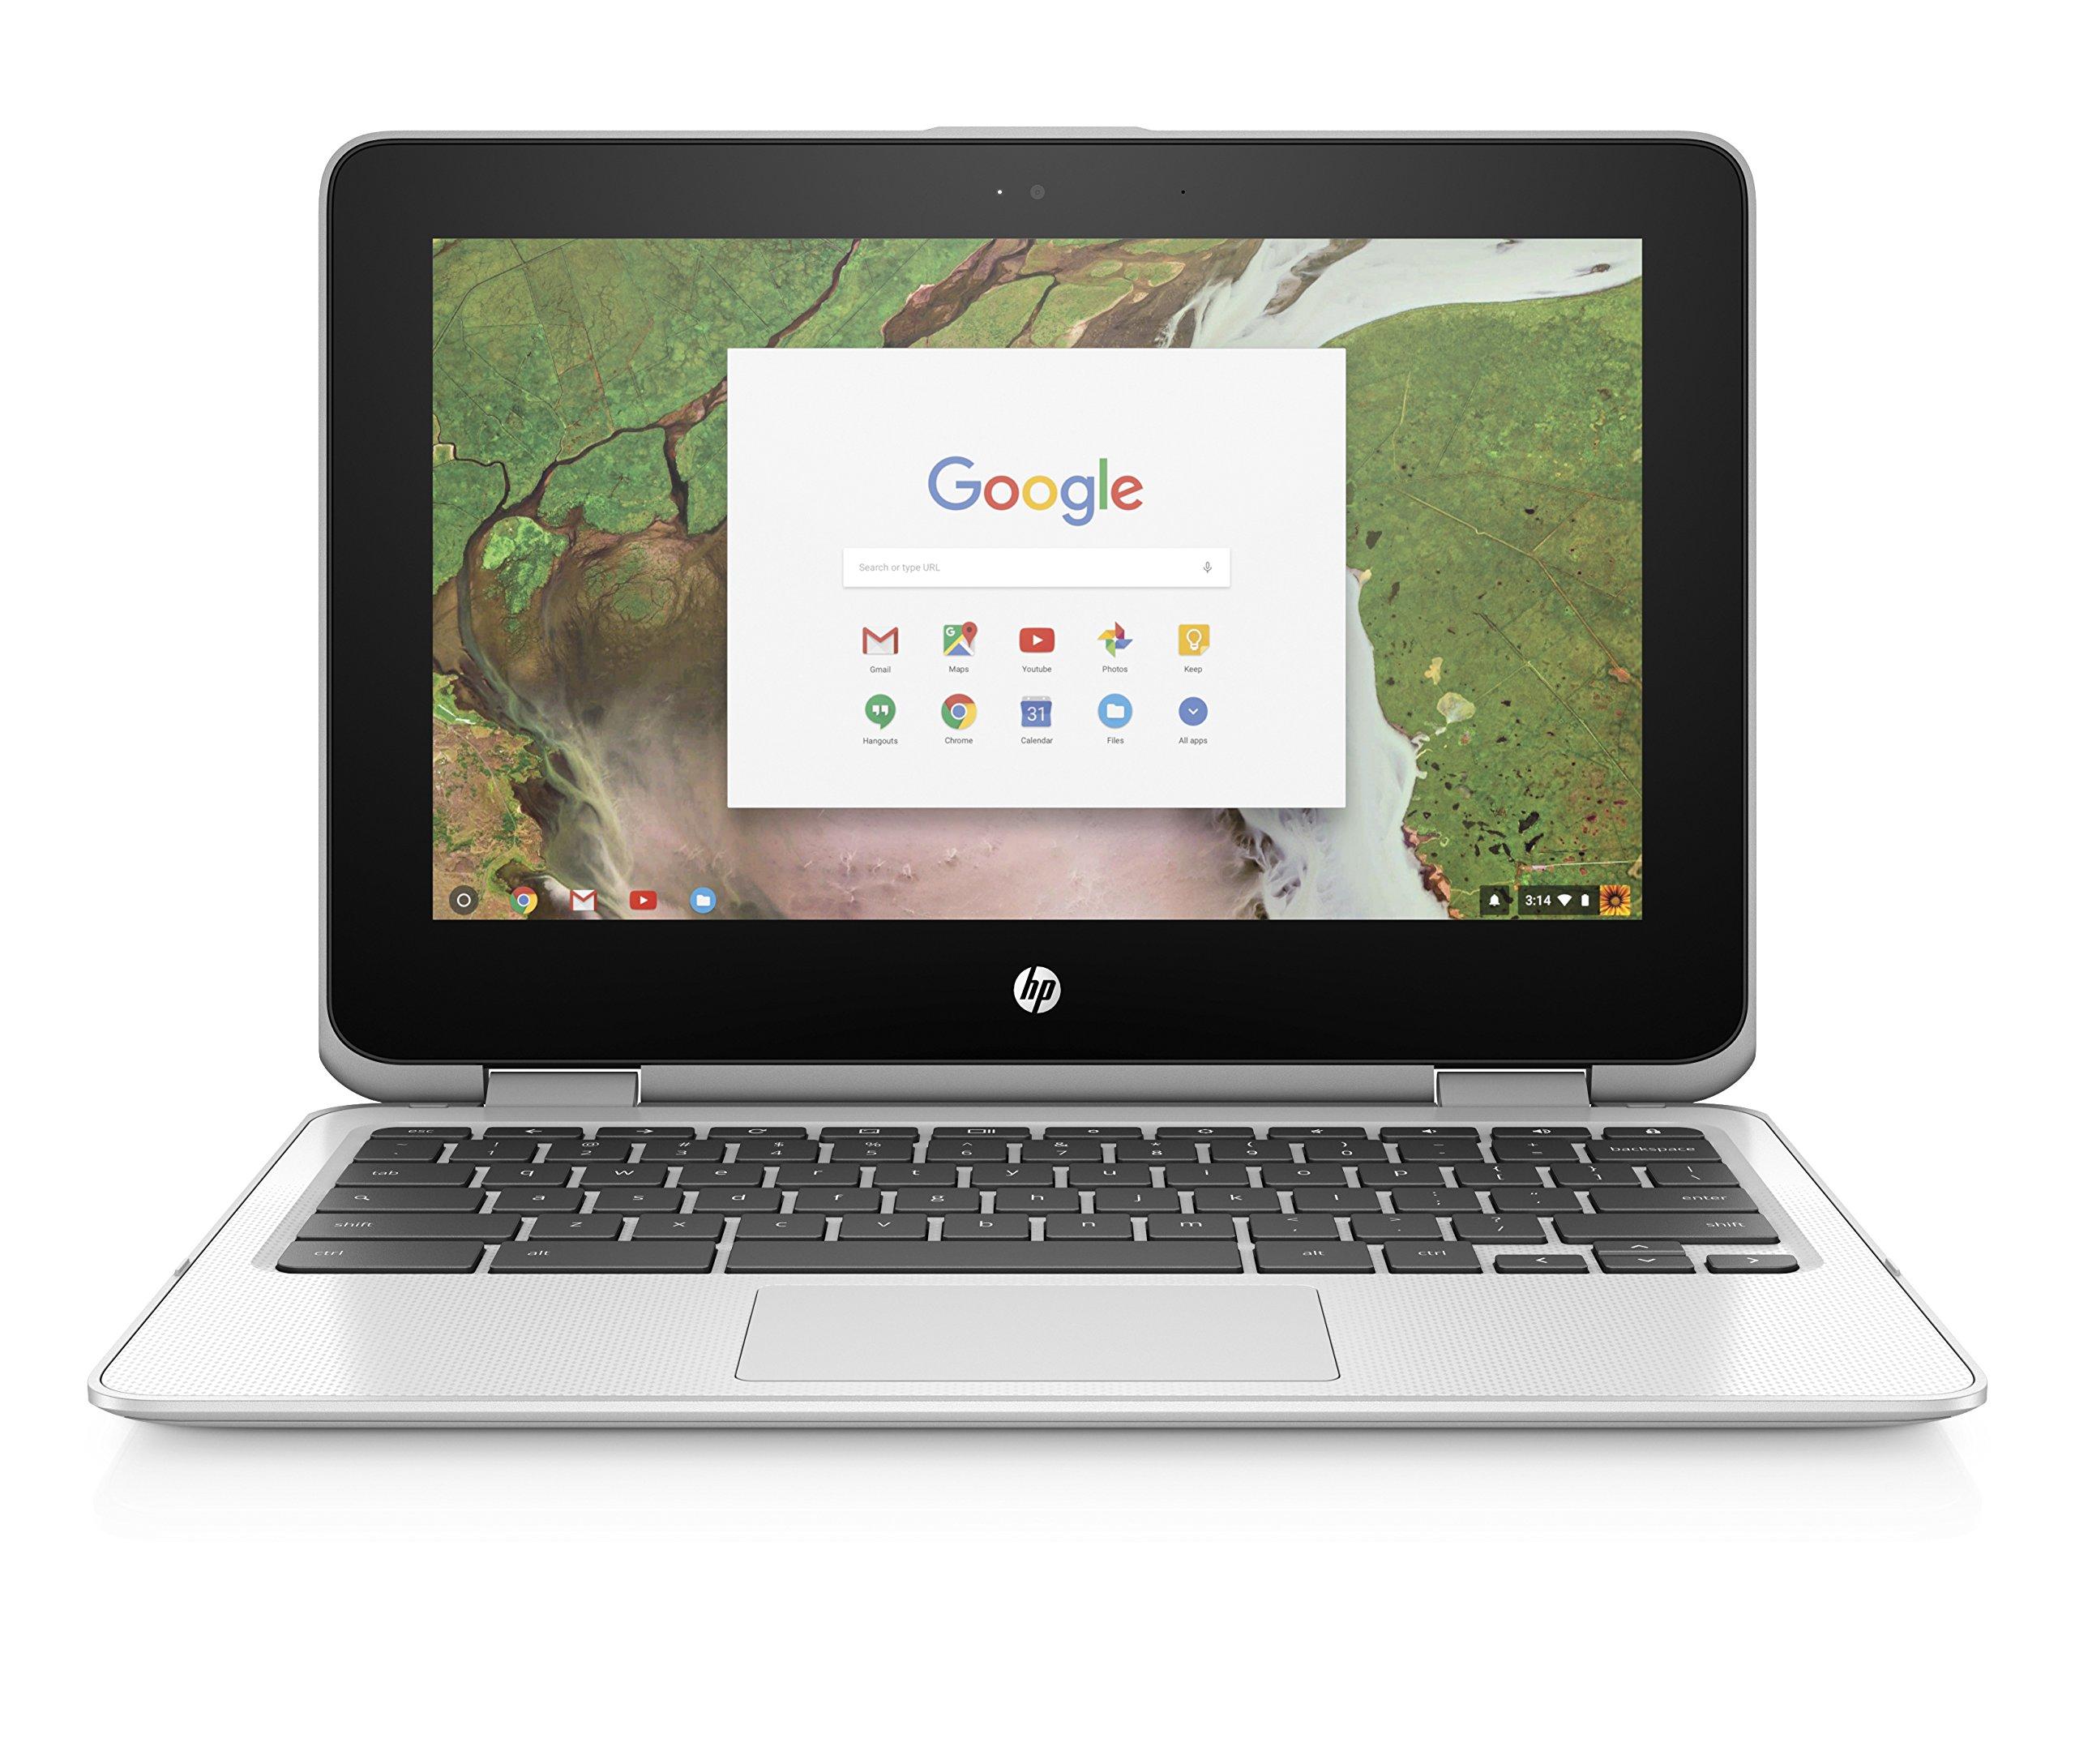 HP Chromebook x360 11-inch Convertible Laptop, Intel Celeron N3350, 4GB RAM, 32GB eMMC storage, Chrome OS (11-ae040nr, White) by HP (Image #1)